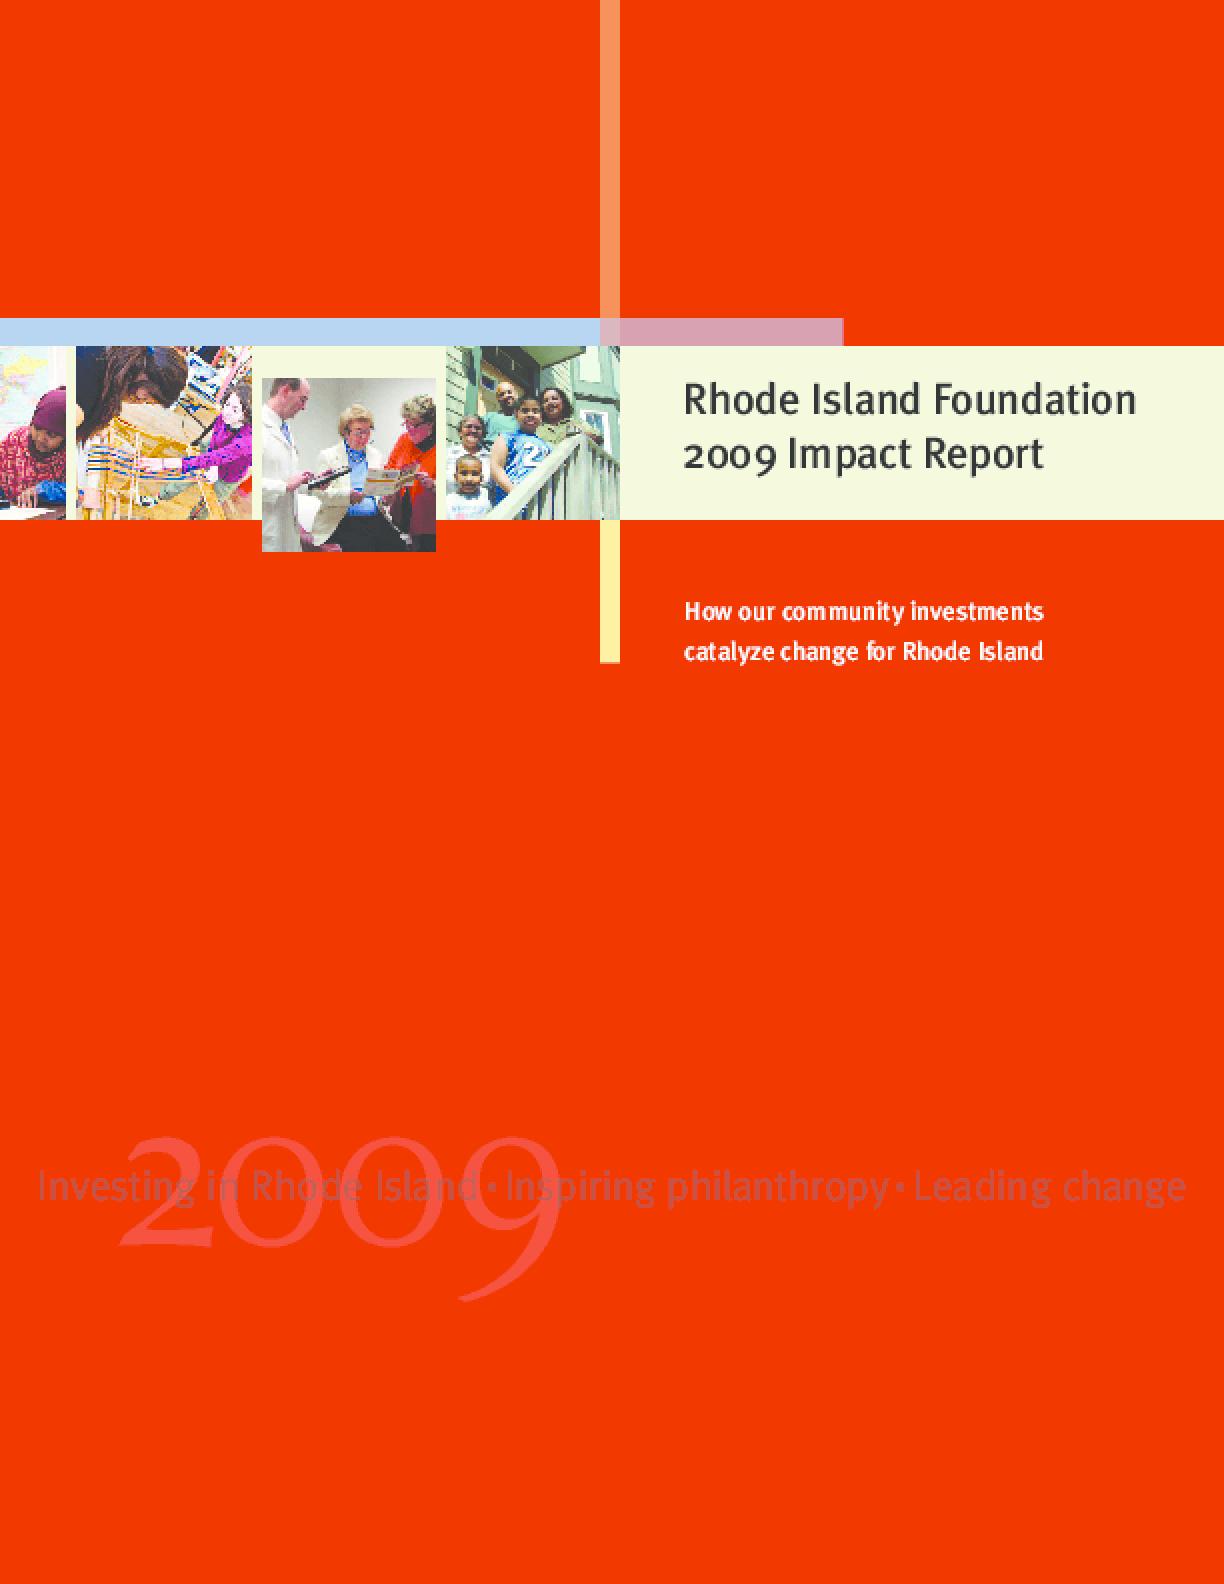 2009 Impact Report